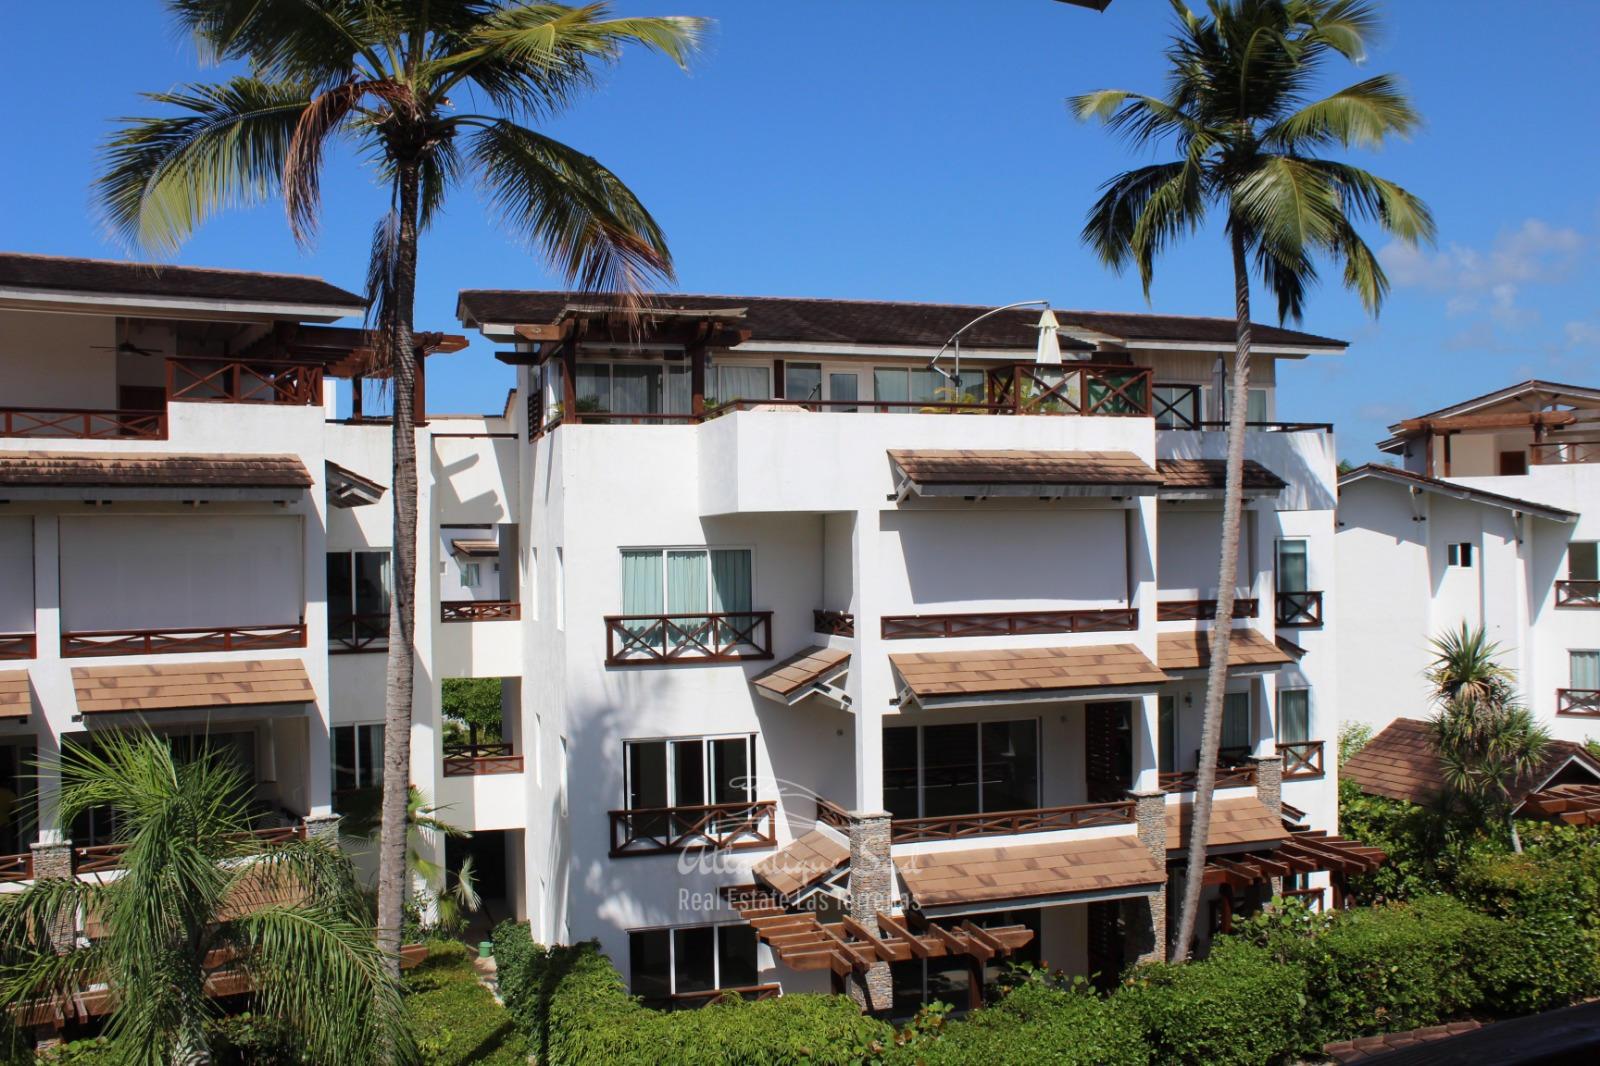 Apartments near the beach real estate las terrenas dominican republic 31 (27).jpg